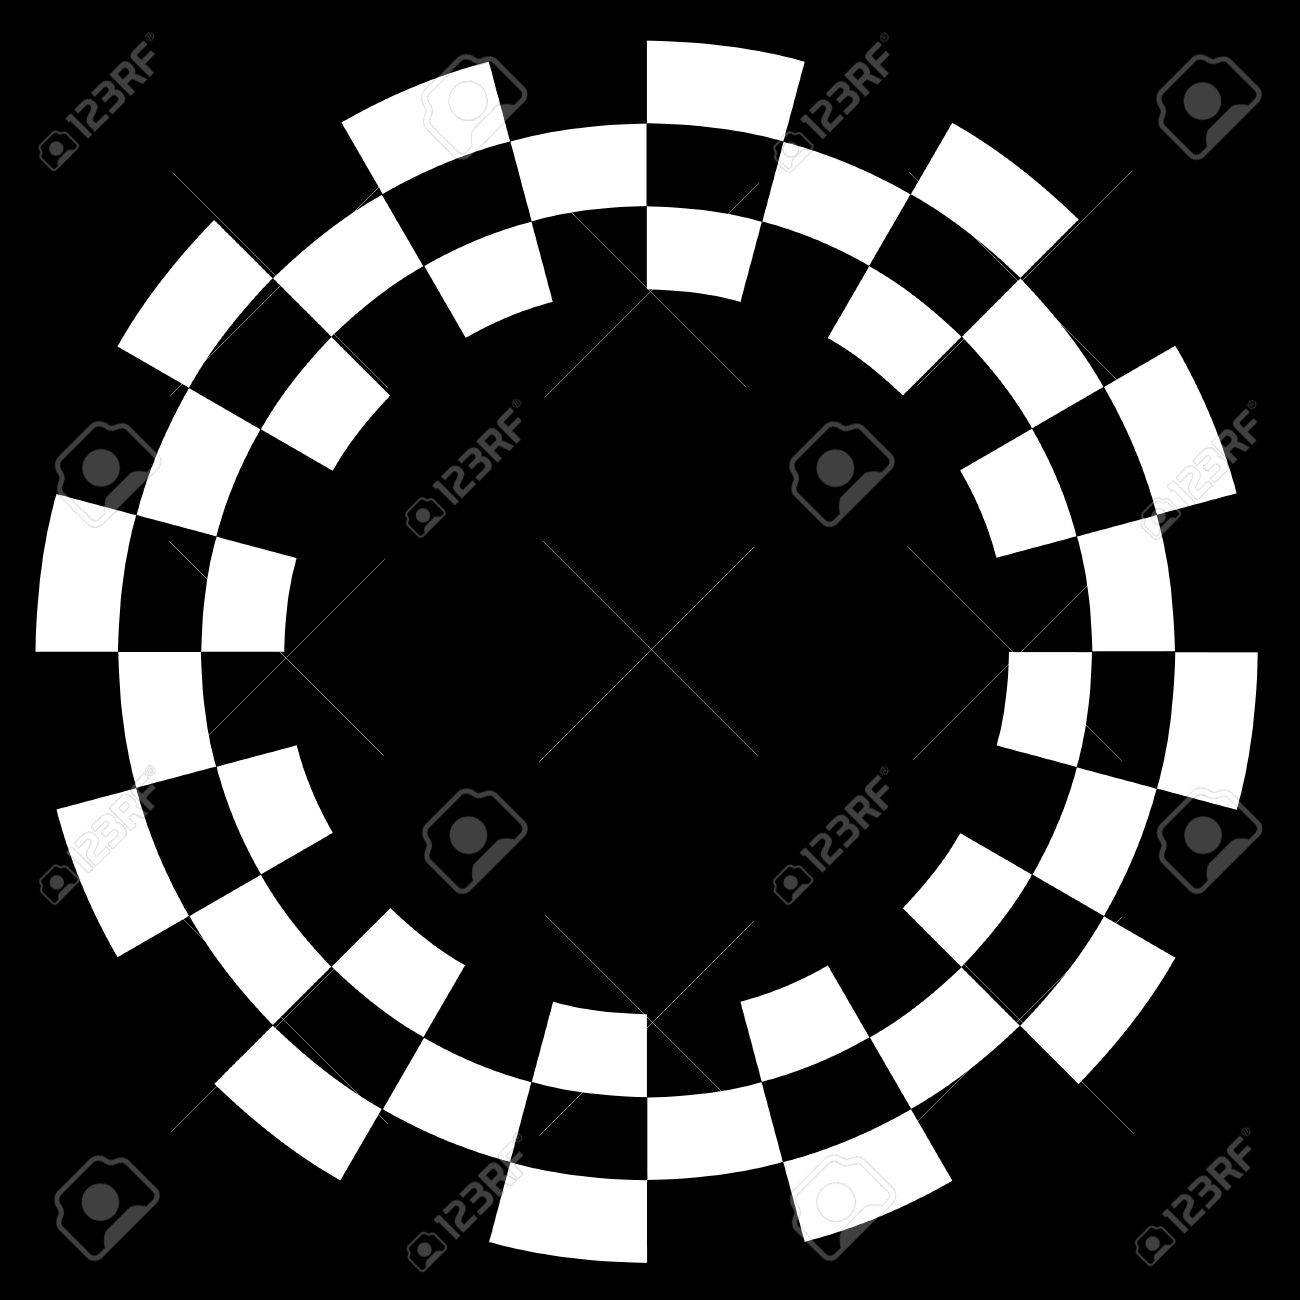 Checkerboard Frame, Spiral Design Border Pattern, Copy Space, White on Black  EPS8 Stock Vector - 12496747